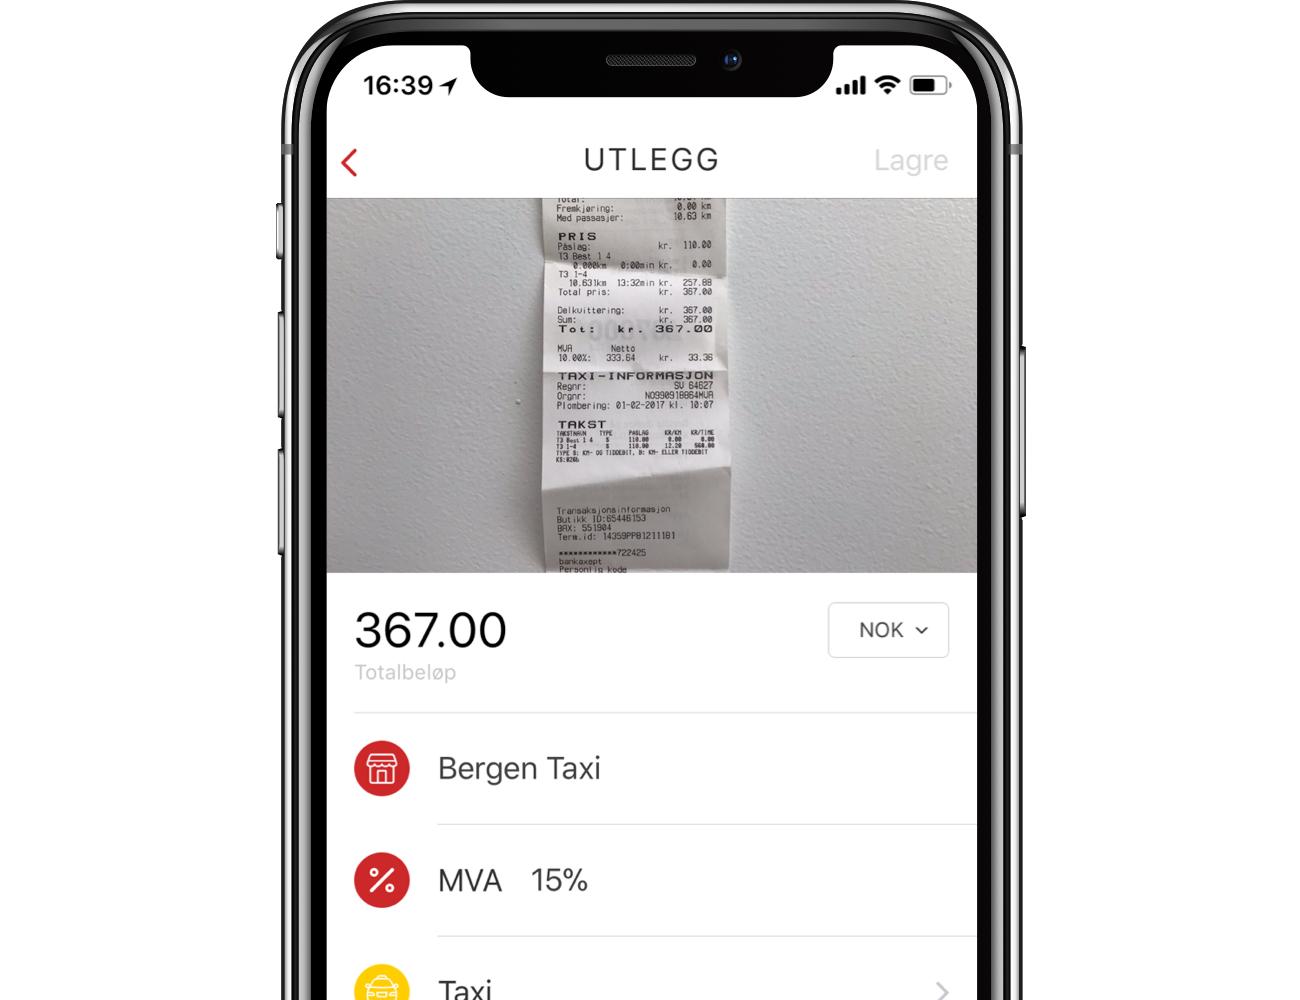 Reiseregning app